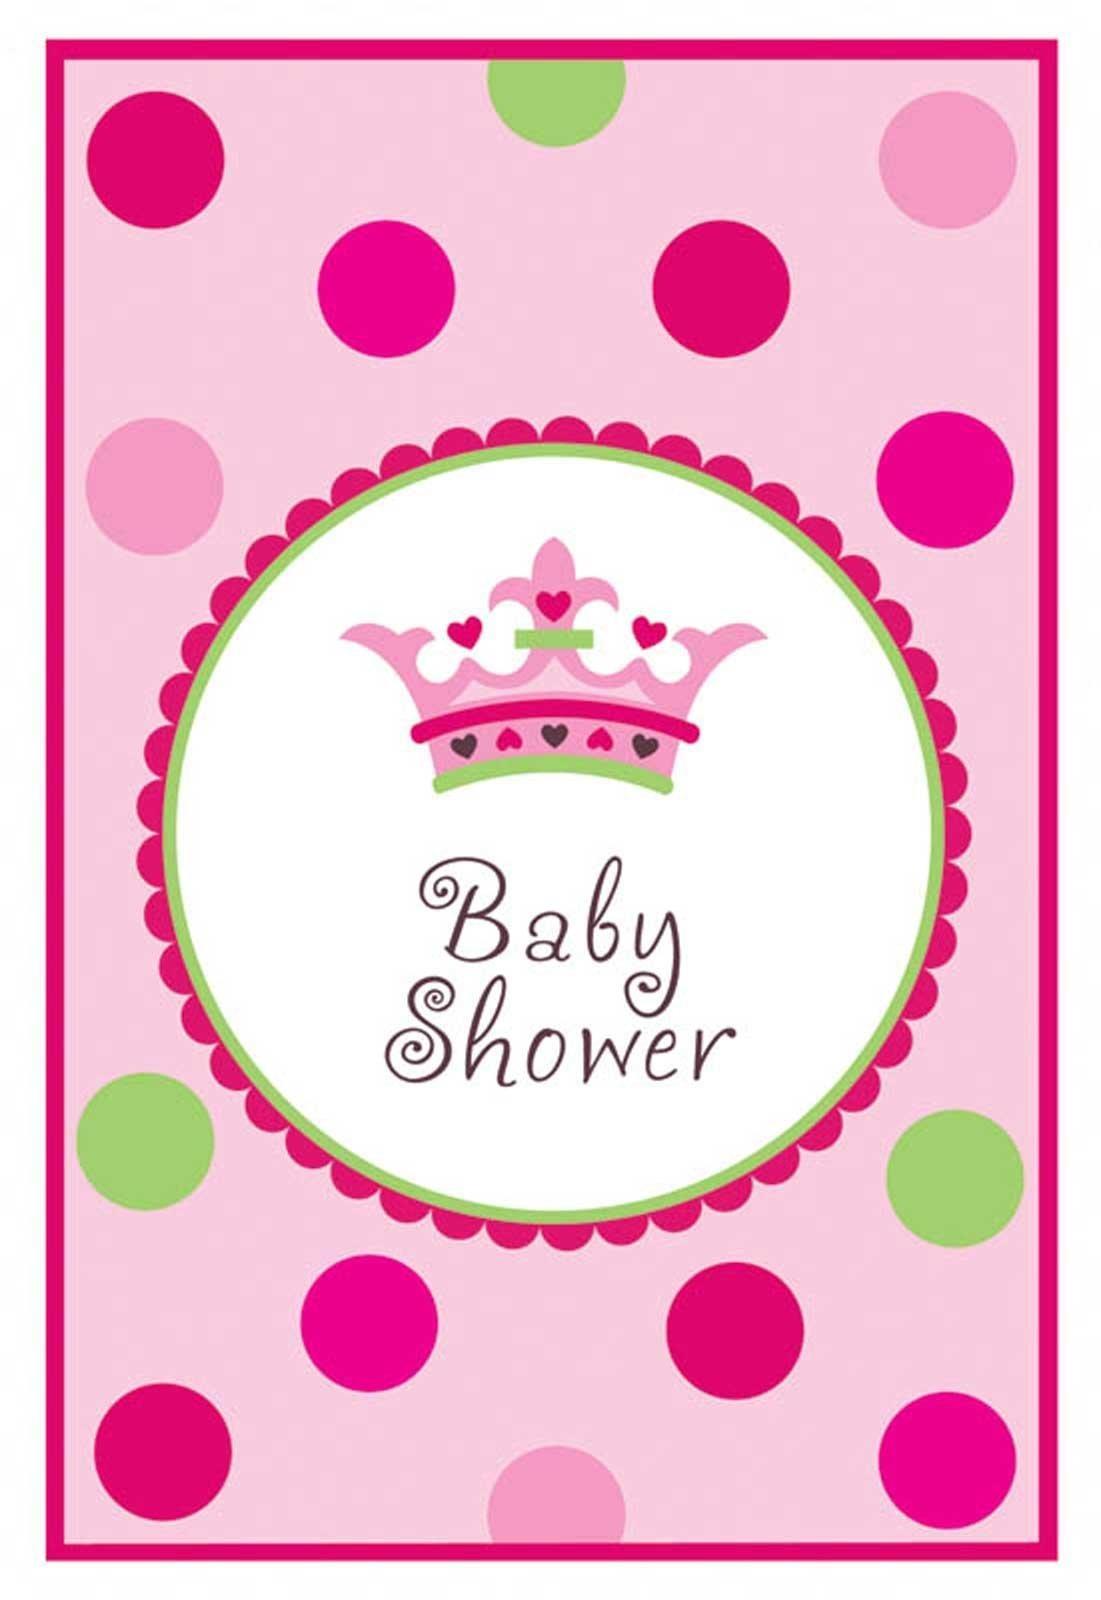 Photo : Princess Baby Shower Invitations Image - Free Printable Princess Baby Shower Invitations